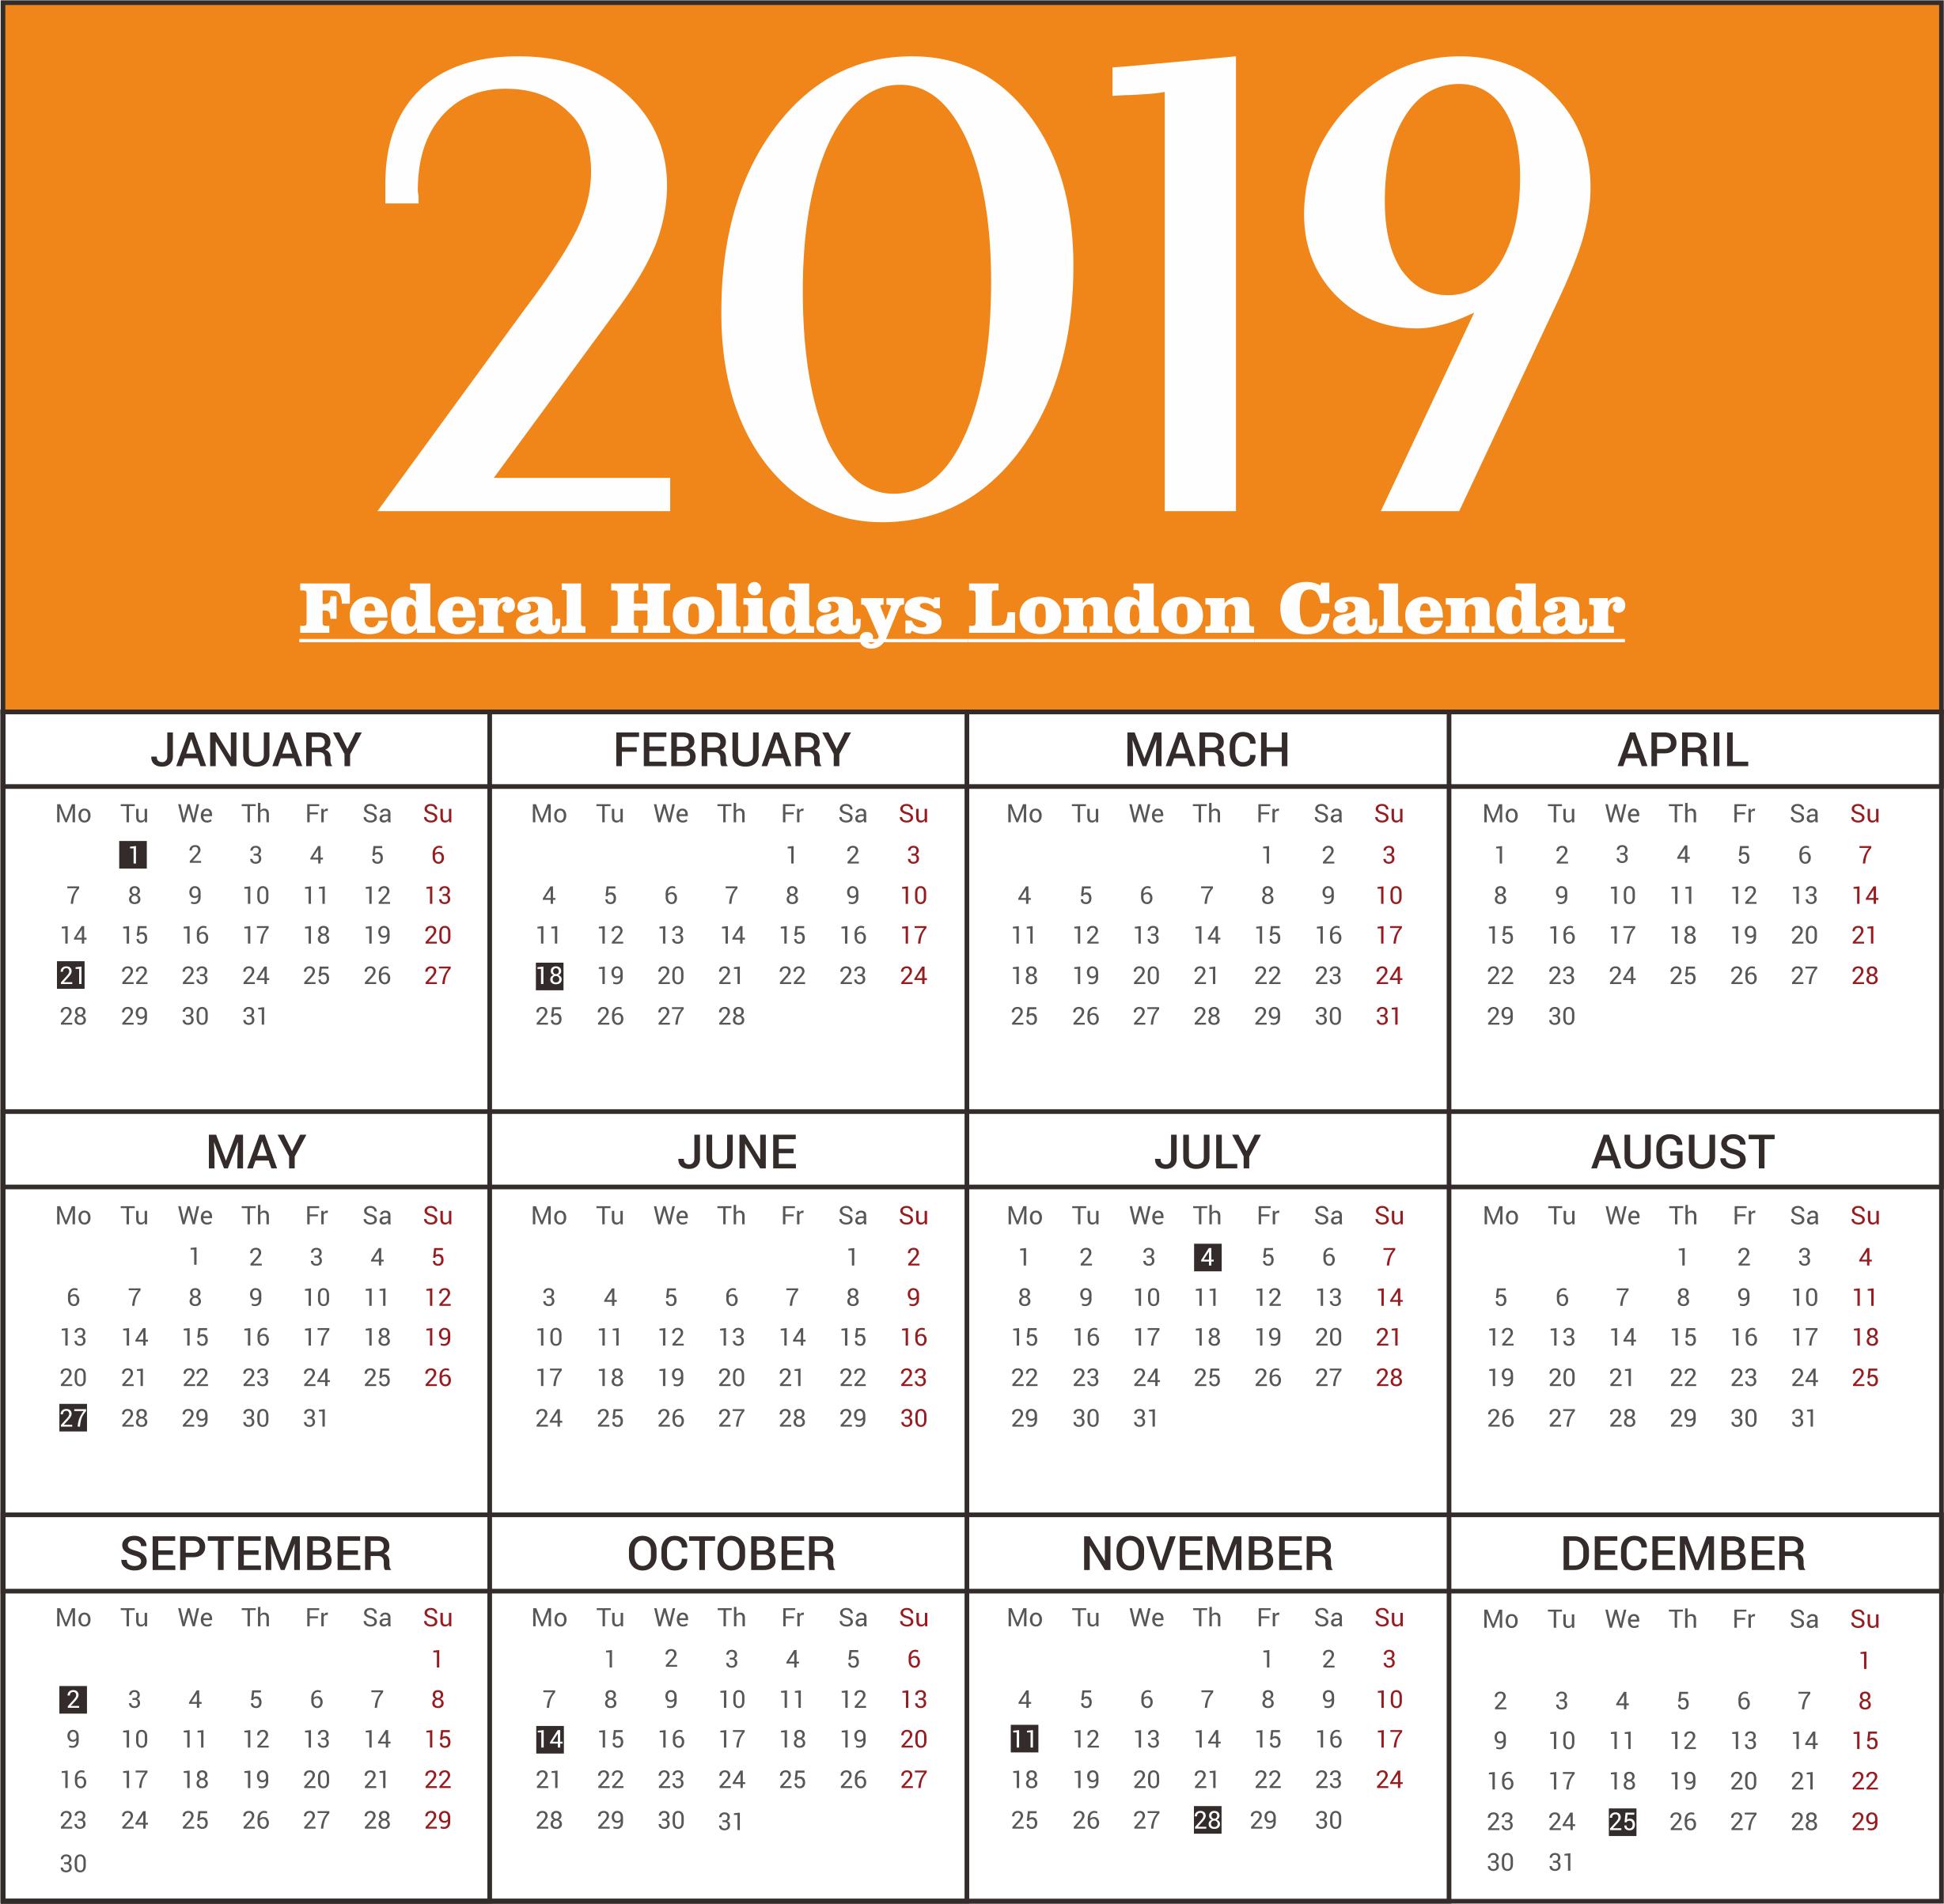 London Federal Holidays Calendar 2019